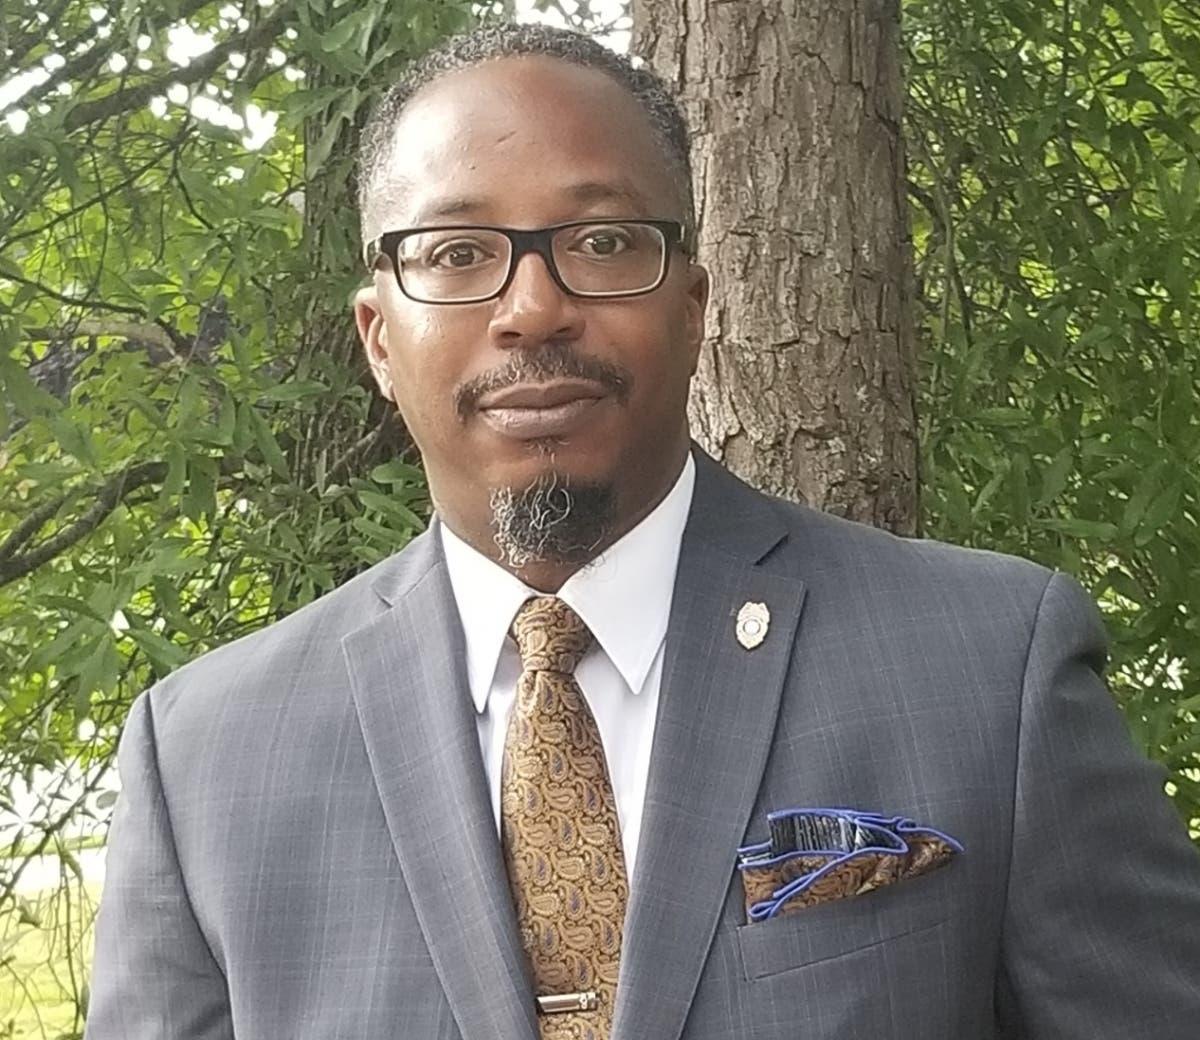 Long-time officer announces bid for Henry Sheriff | Atlanta, GA Patch